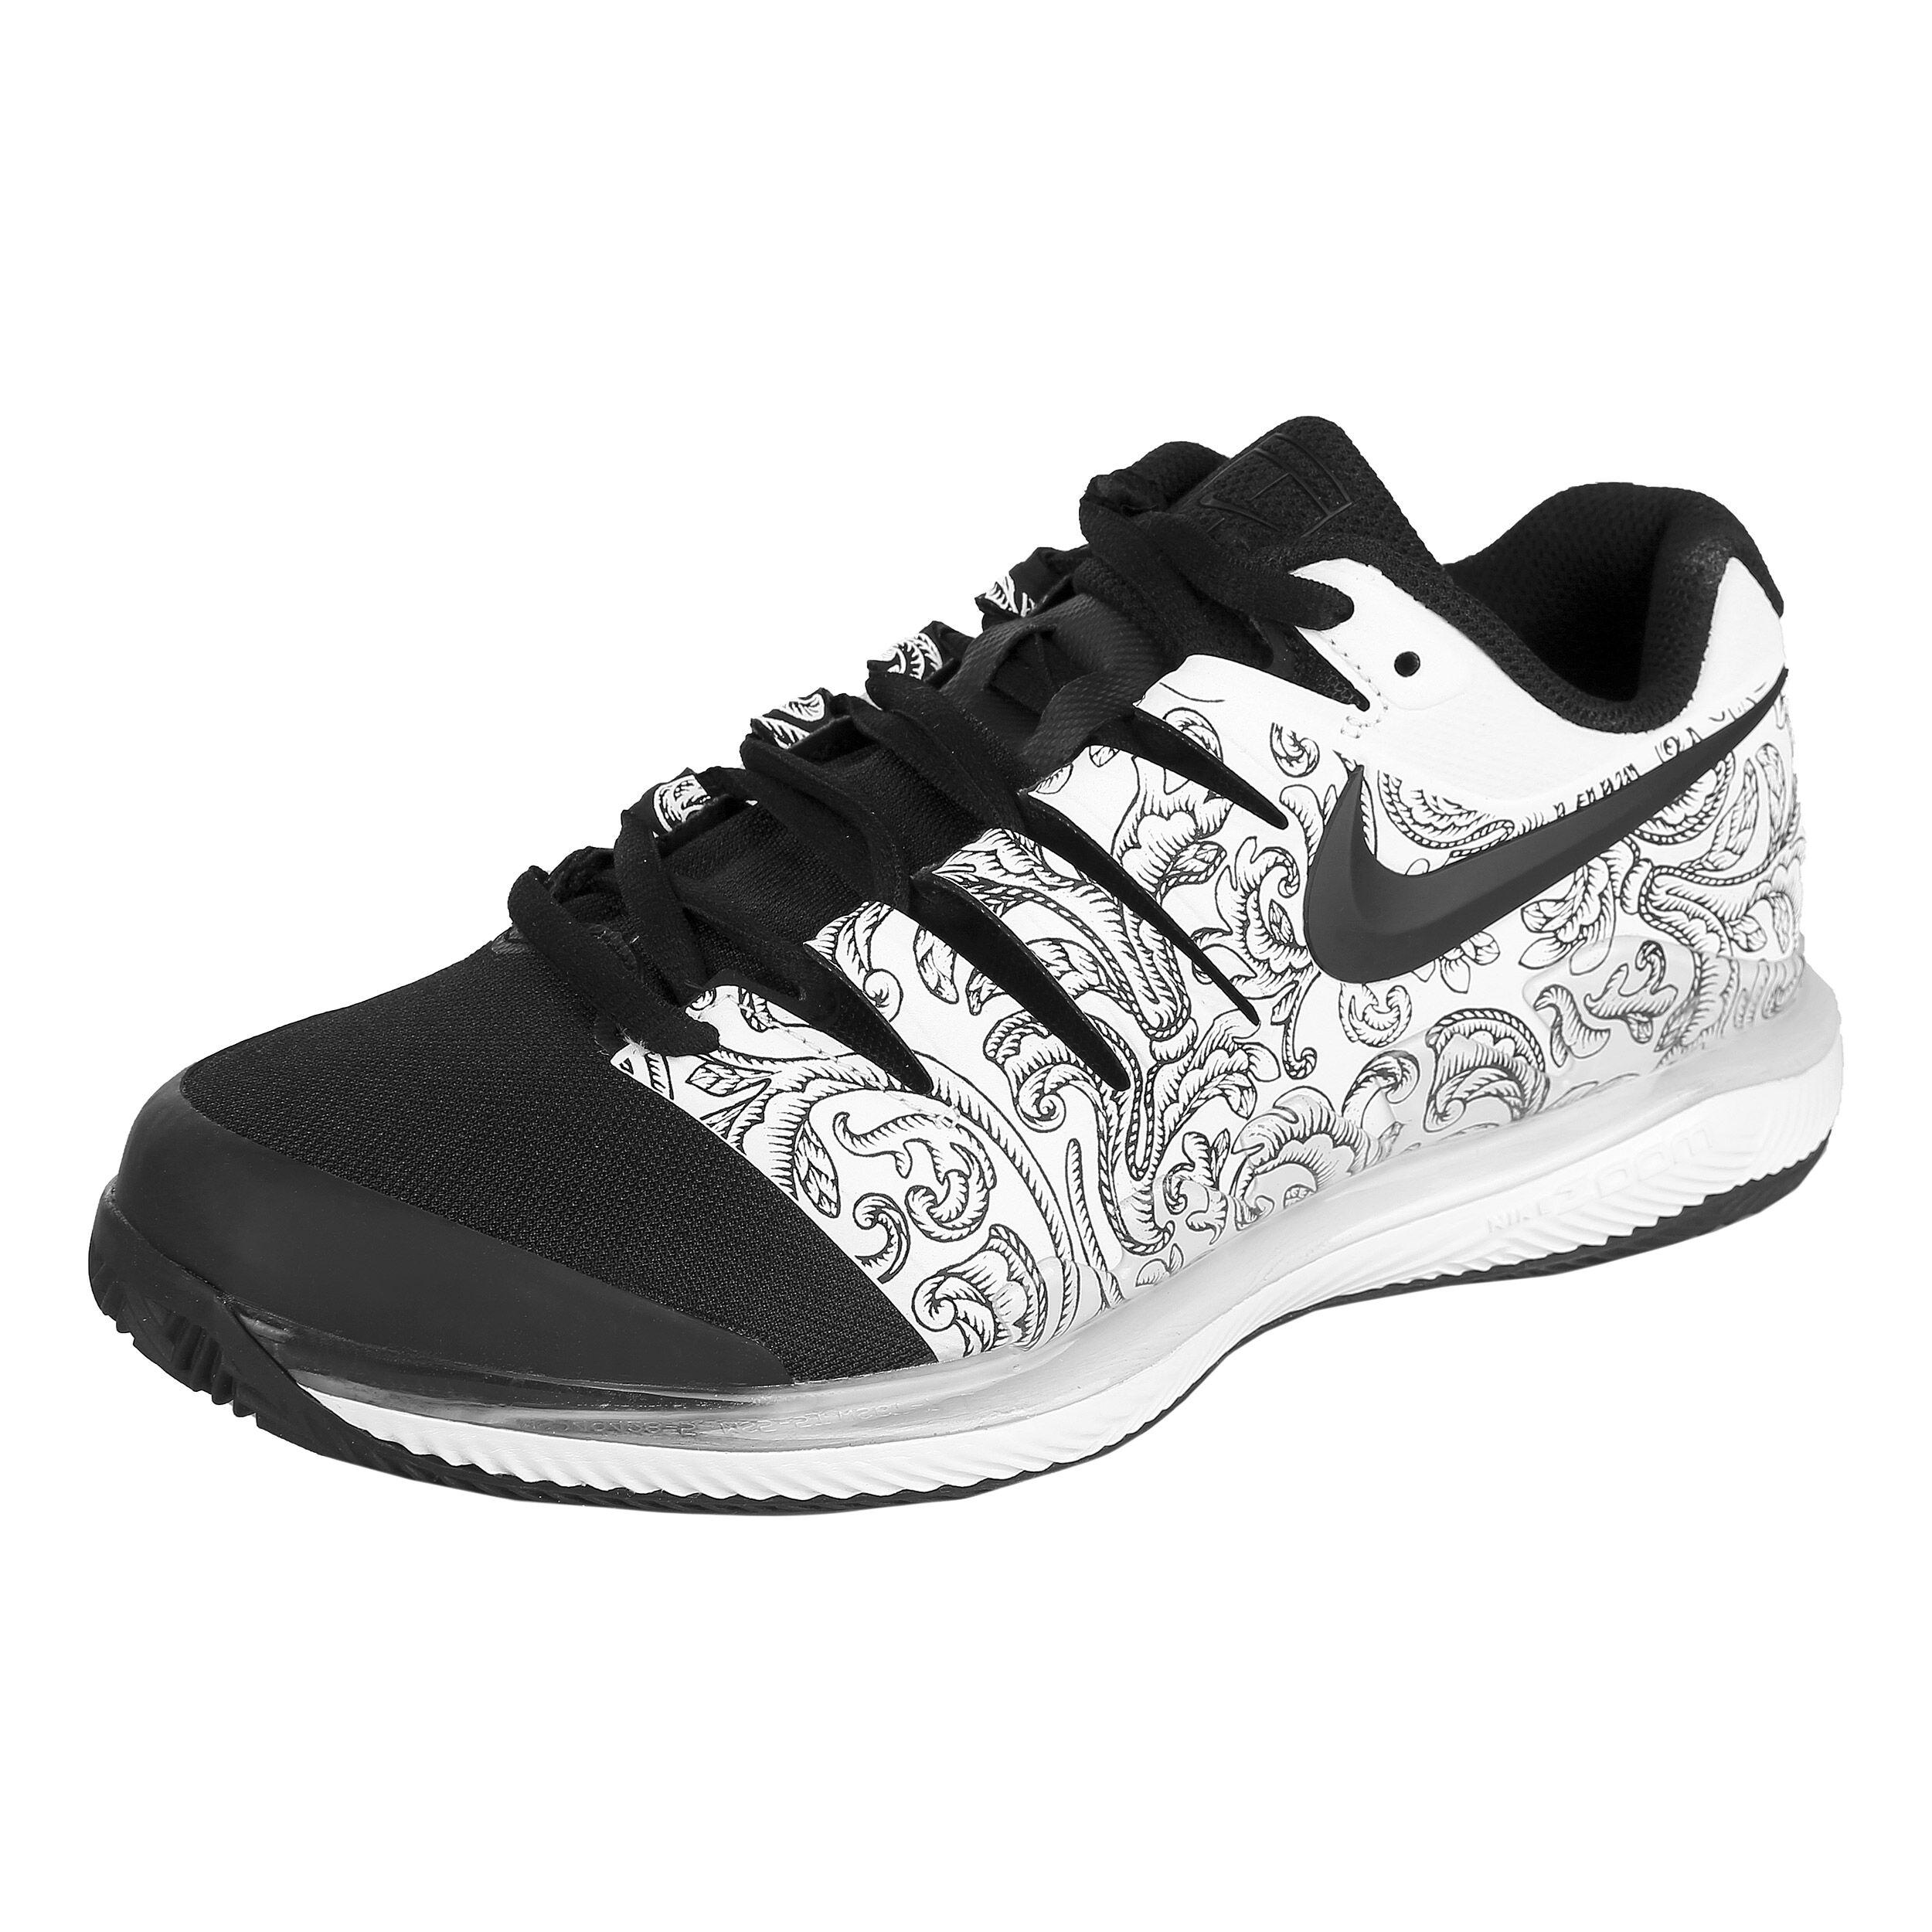 Nike Air Zoom Vapor X Clay Gravelschoen Dames - Wit, Zwart ...